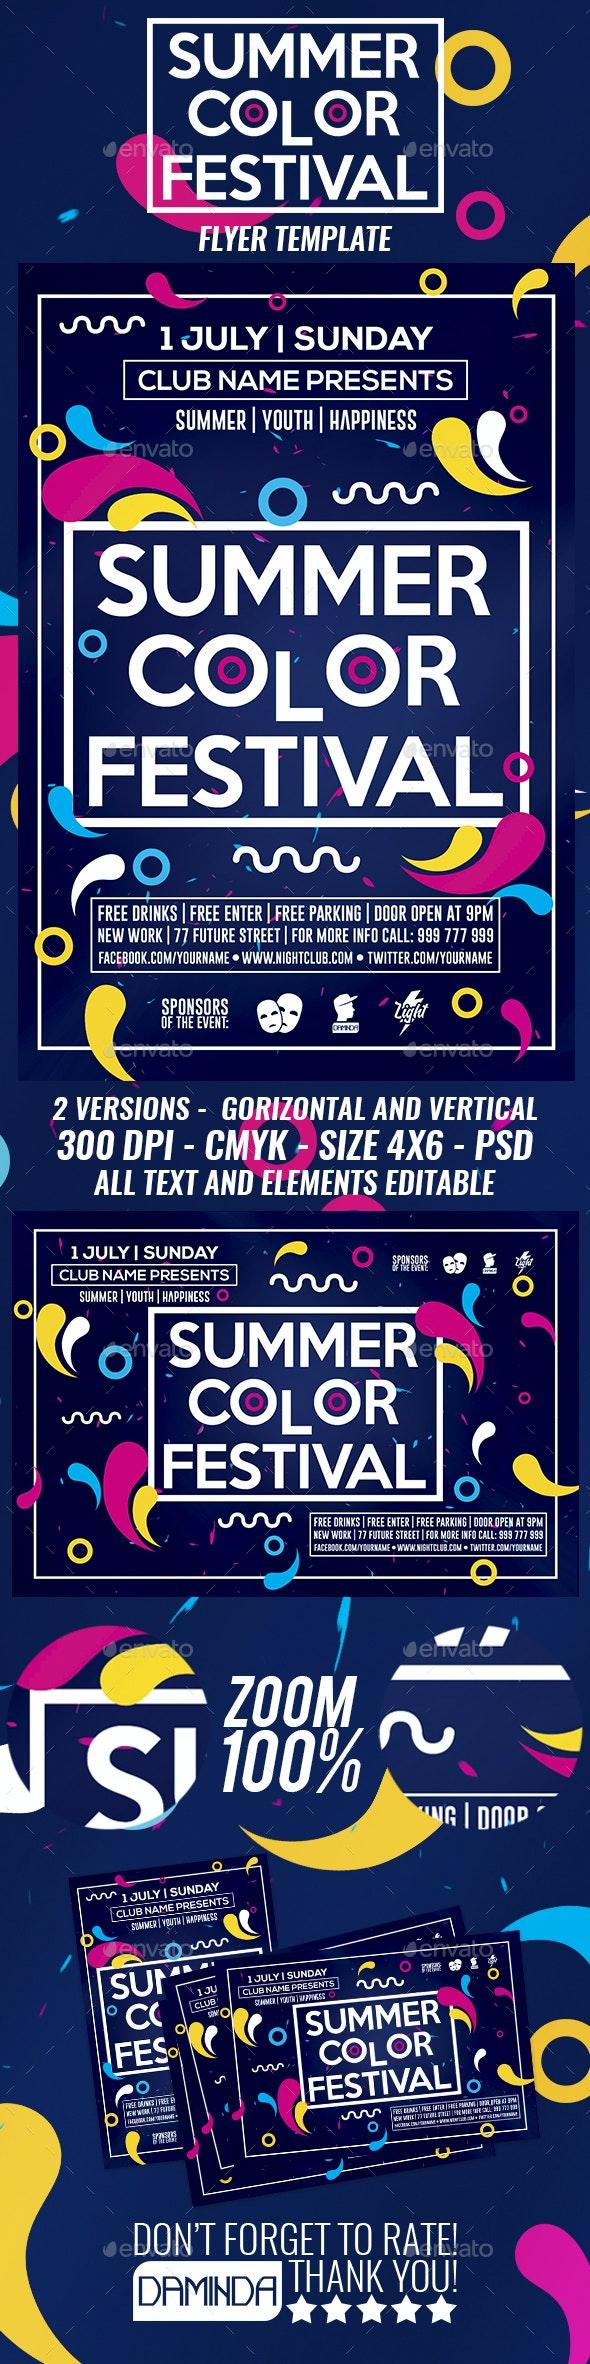 Summer Color Fest 2018 Flyer Template - Clubs & Parties Events